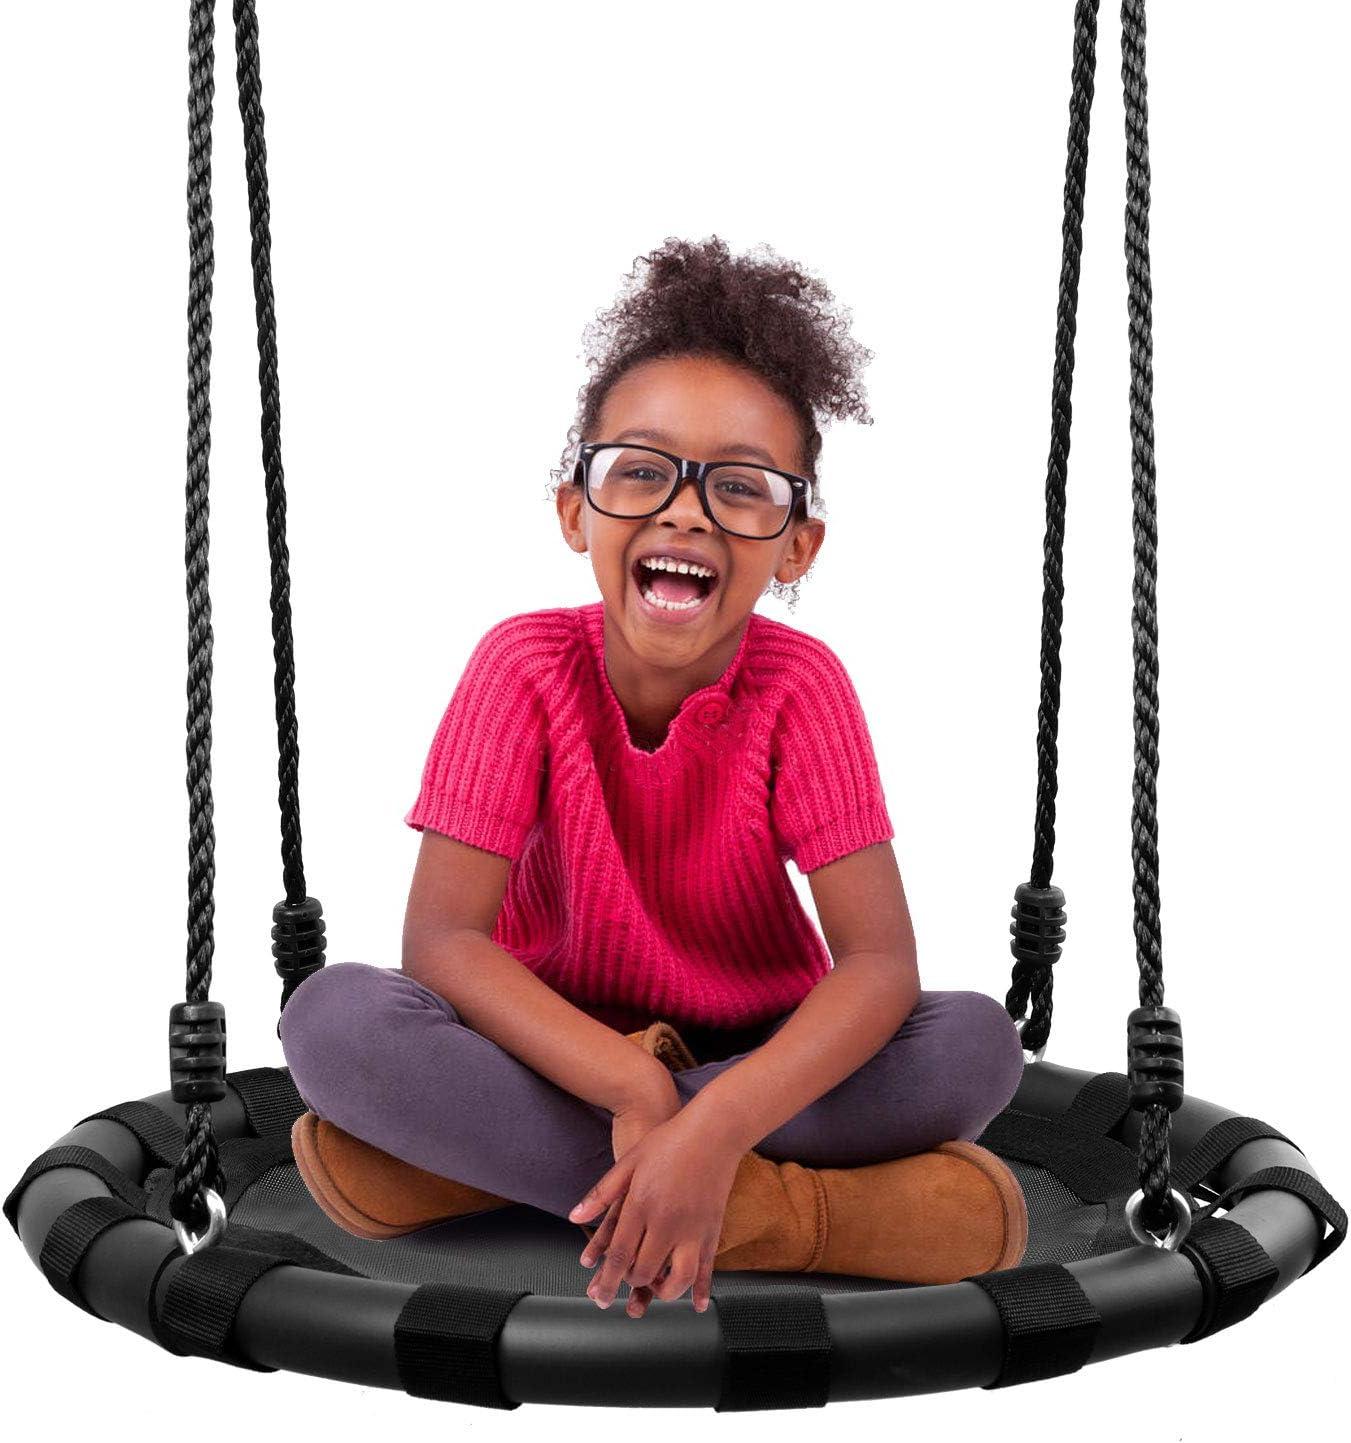 "Odoland 24"" Tree Swing Set for Kids - Outdoor/Indoor Round"